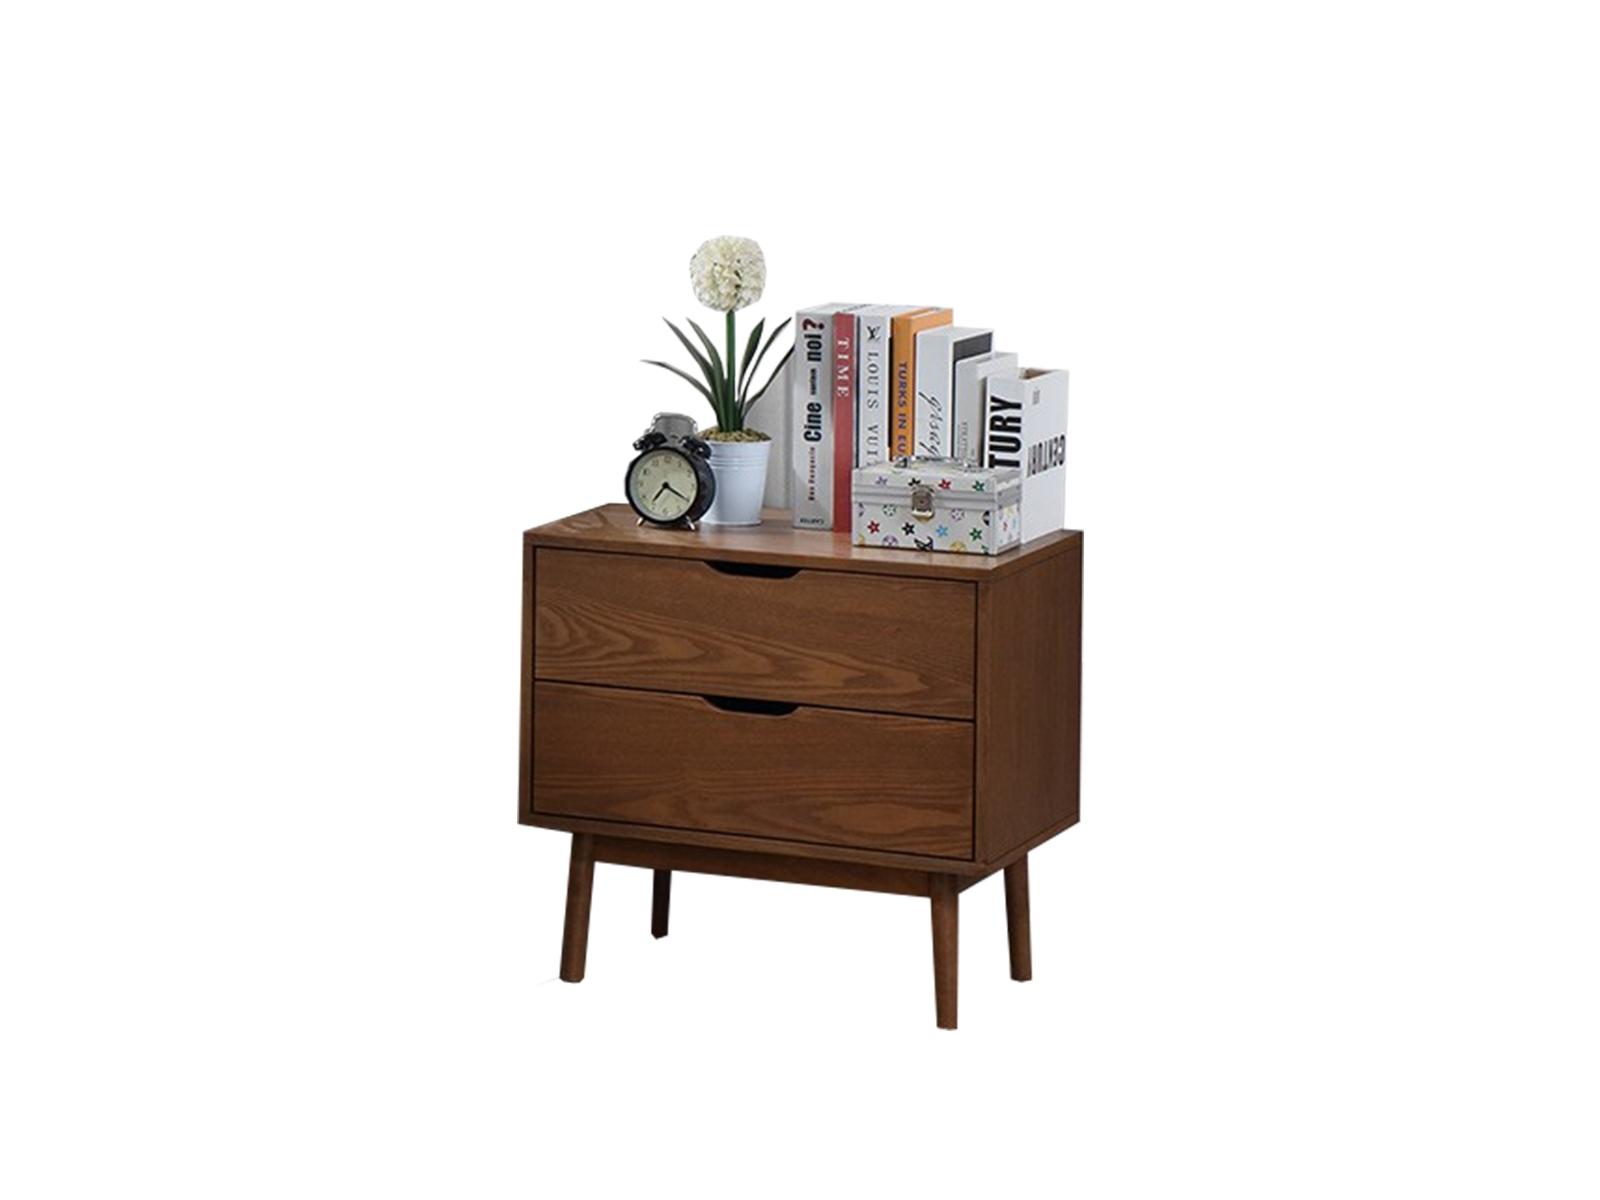 Noptiera din lemn cu 2 sertare Frida Nuc, l58xA40xH56 cm